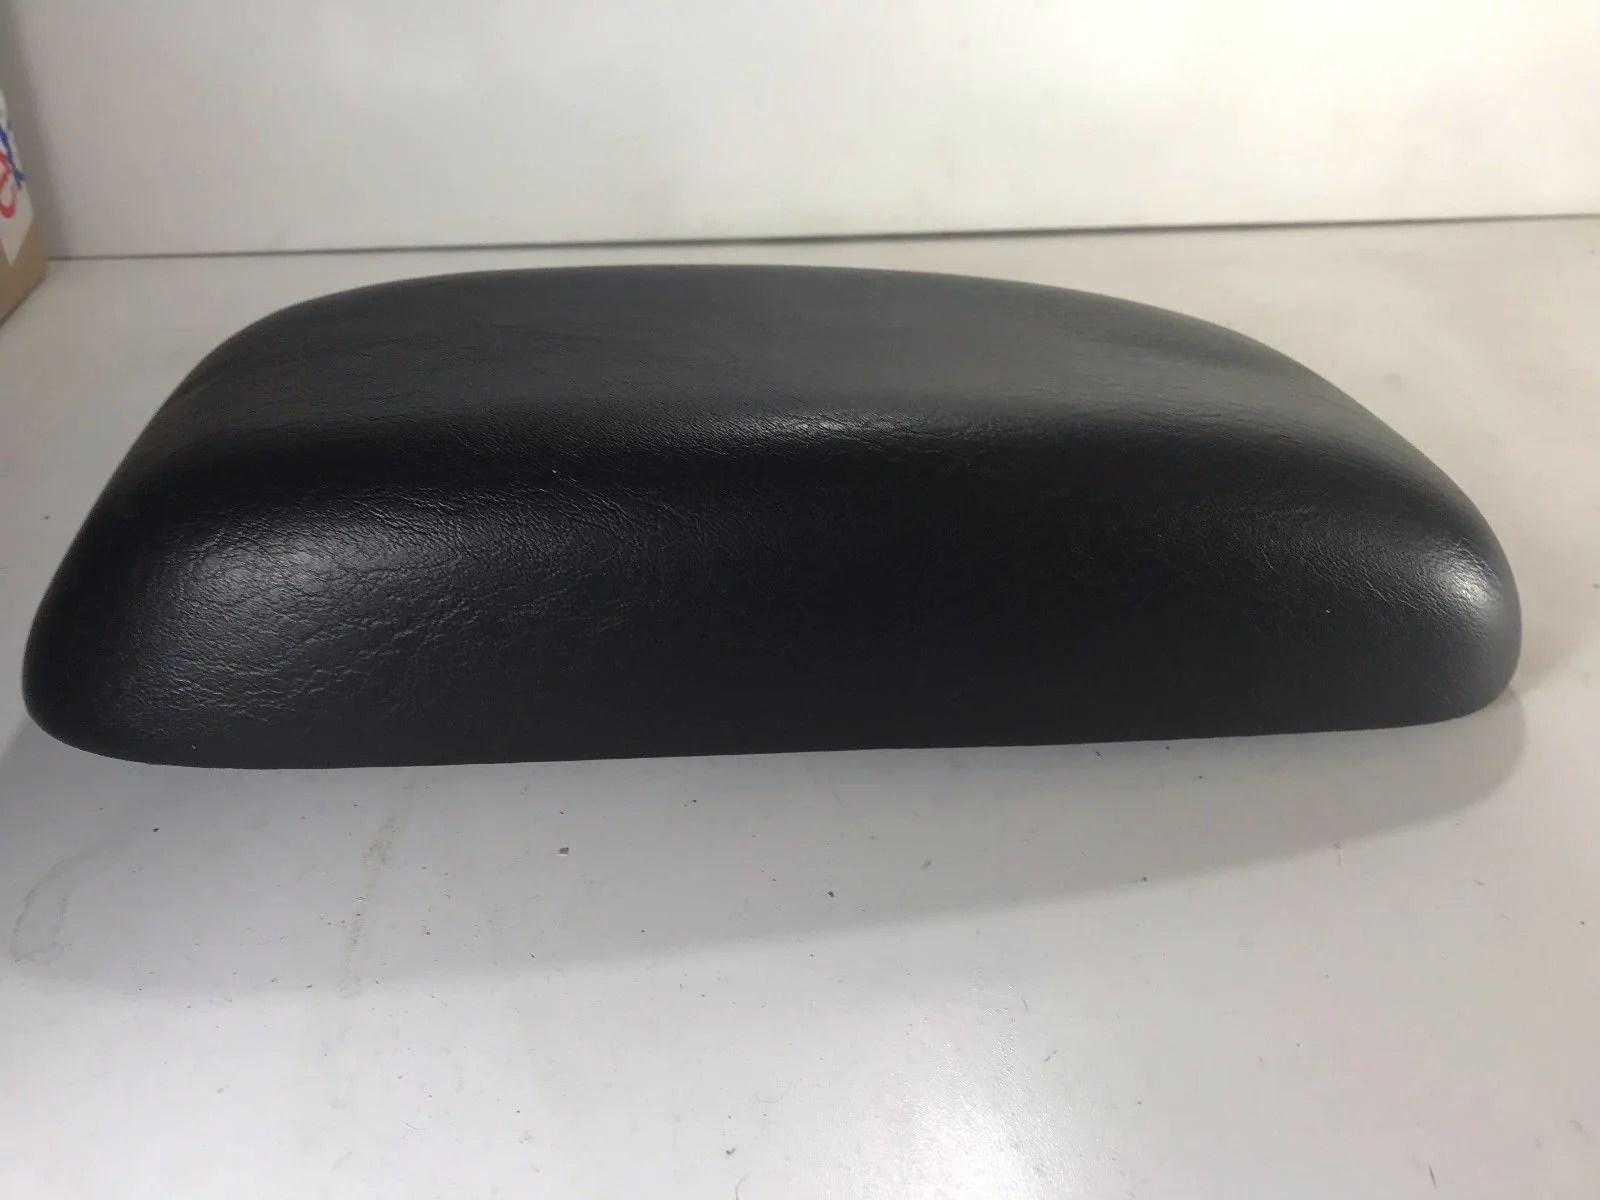 hight resolution of  2000 2005 dodge neon center console arm rest armrest lid top black